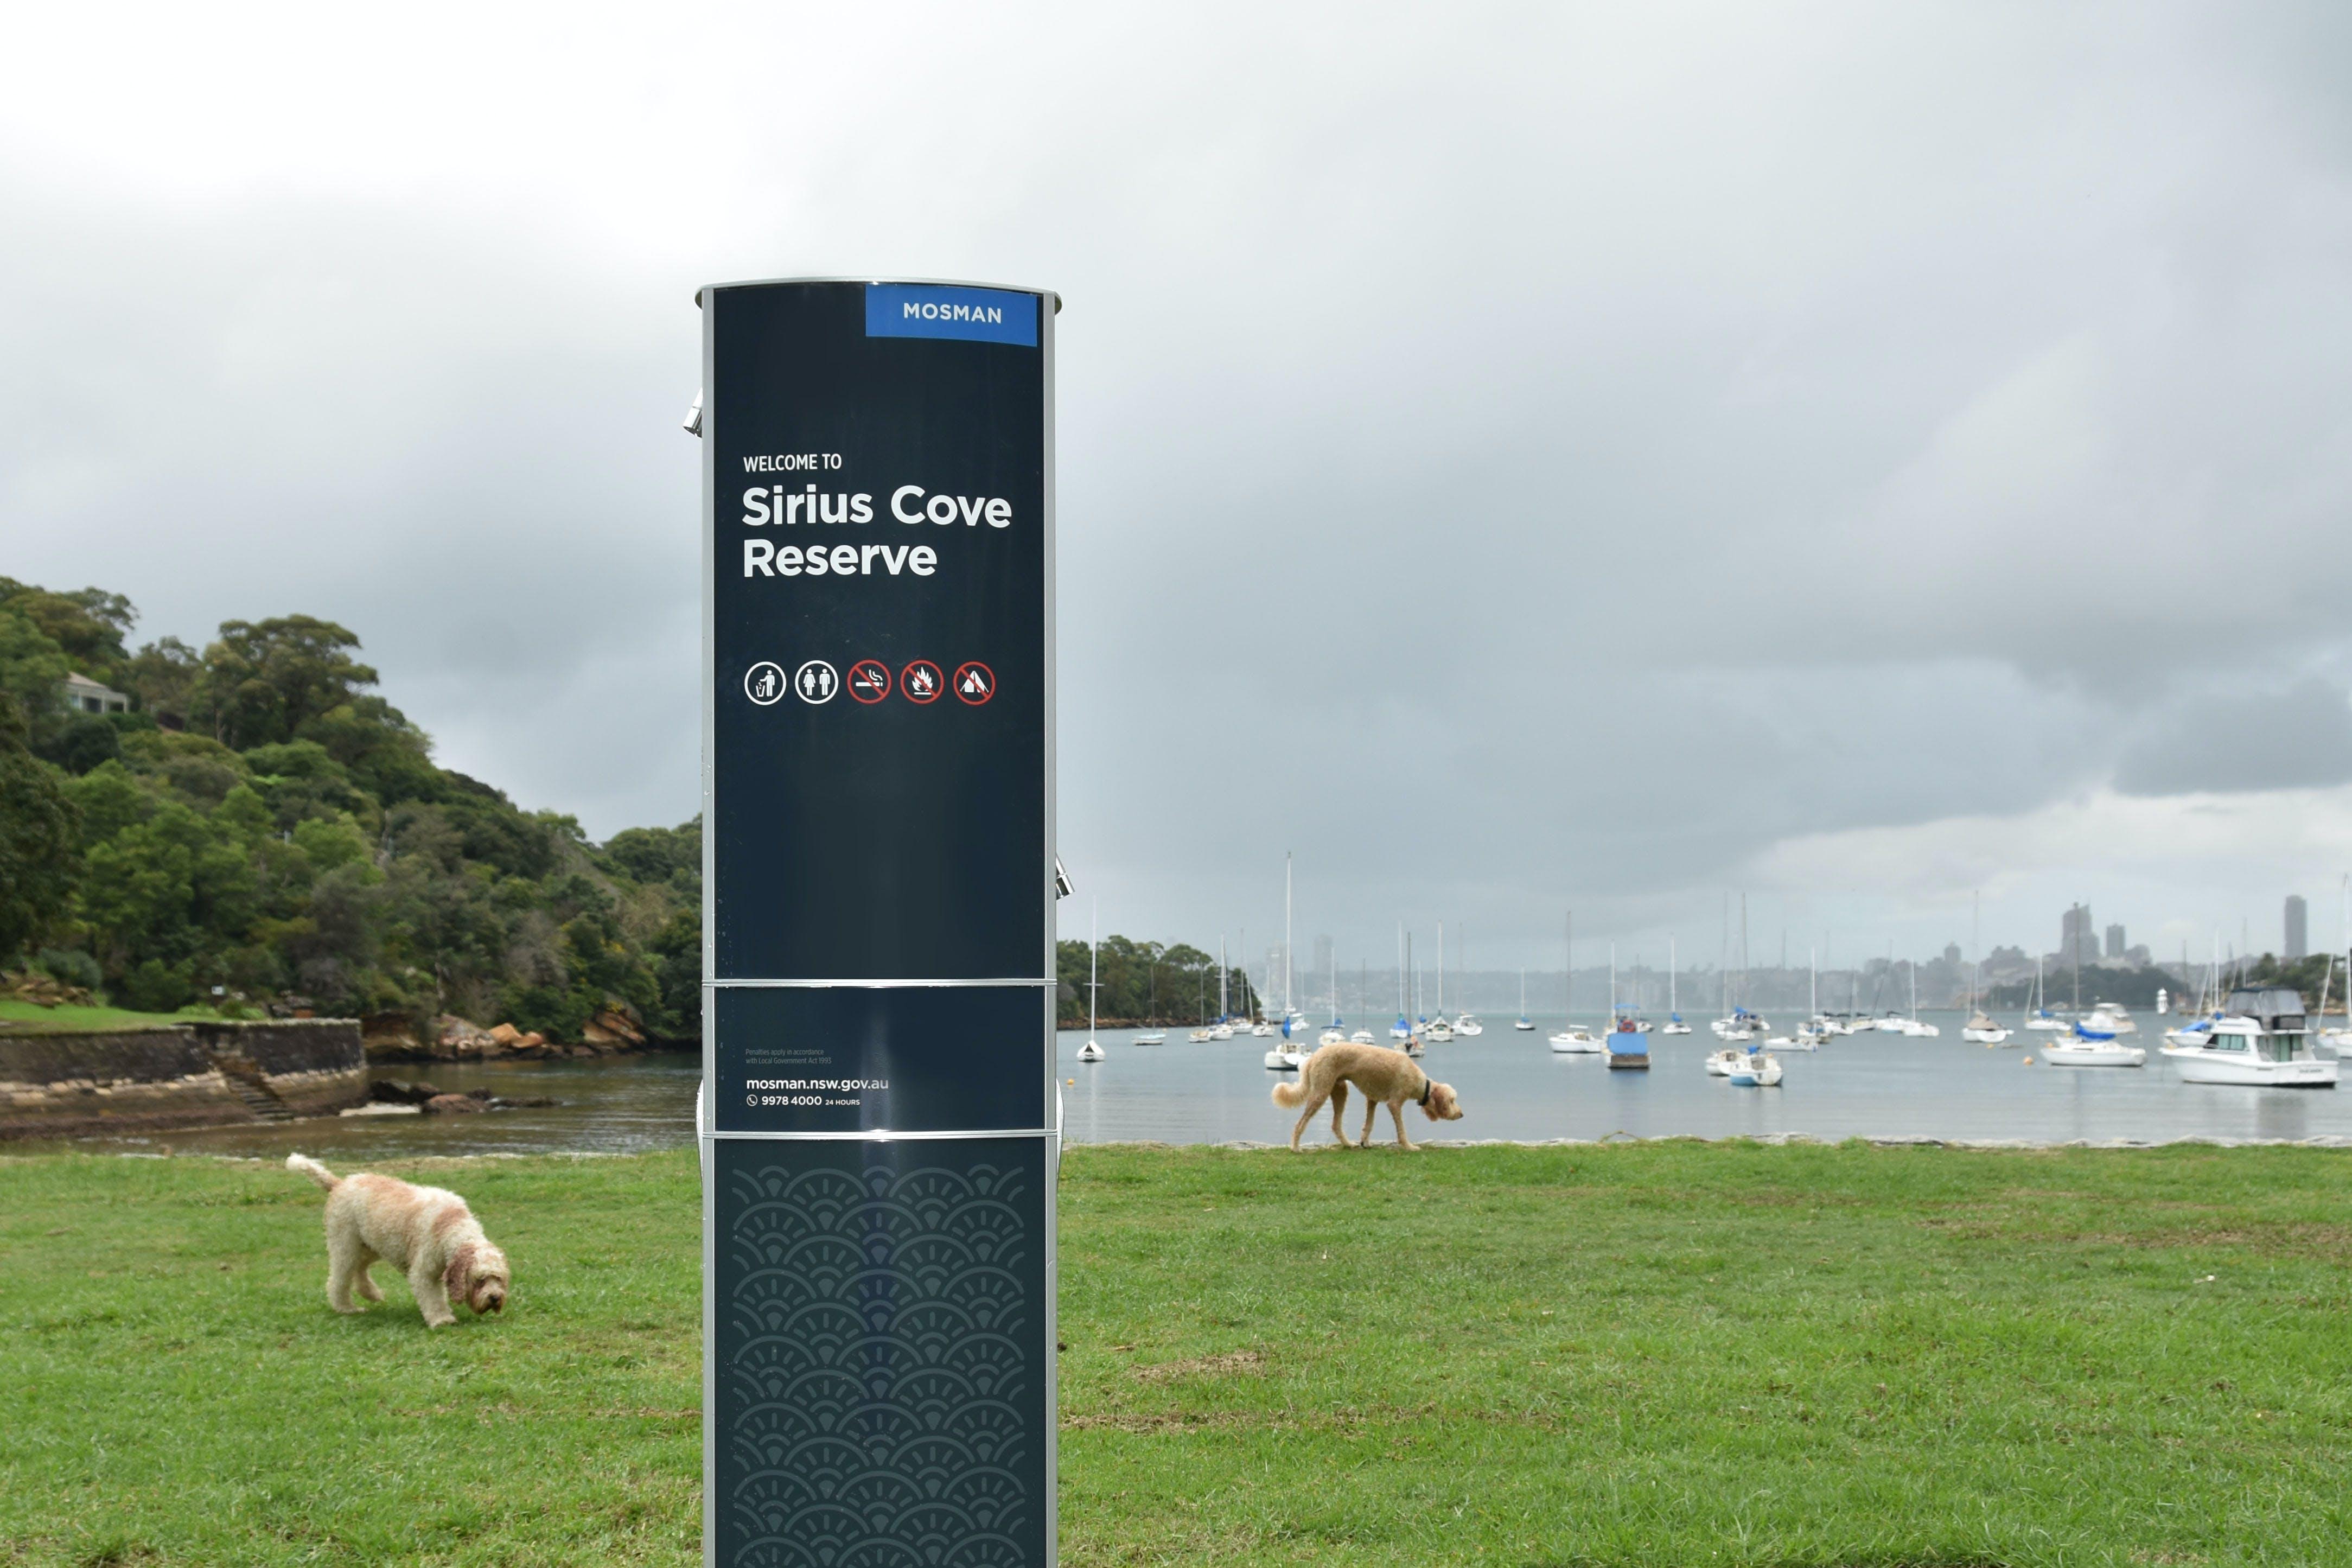 Sirius Cove Reserve